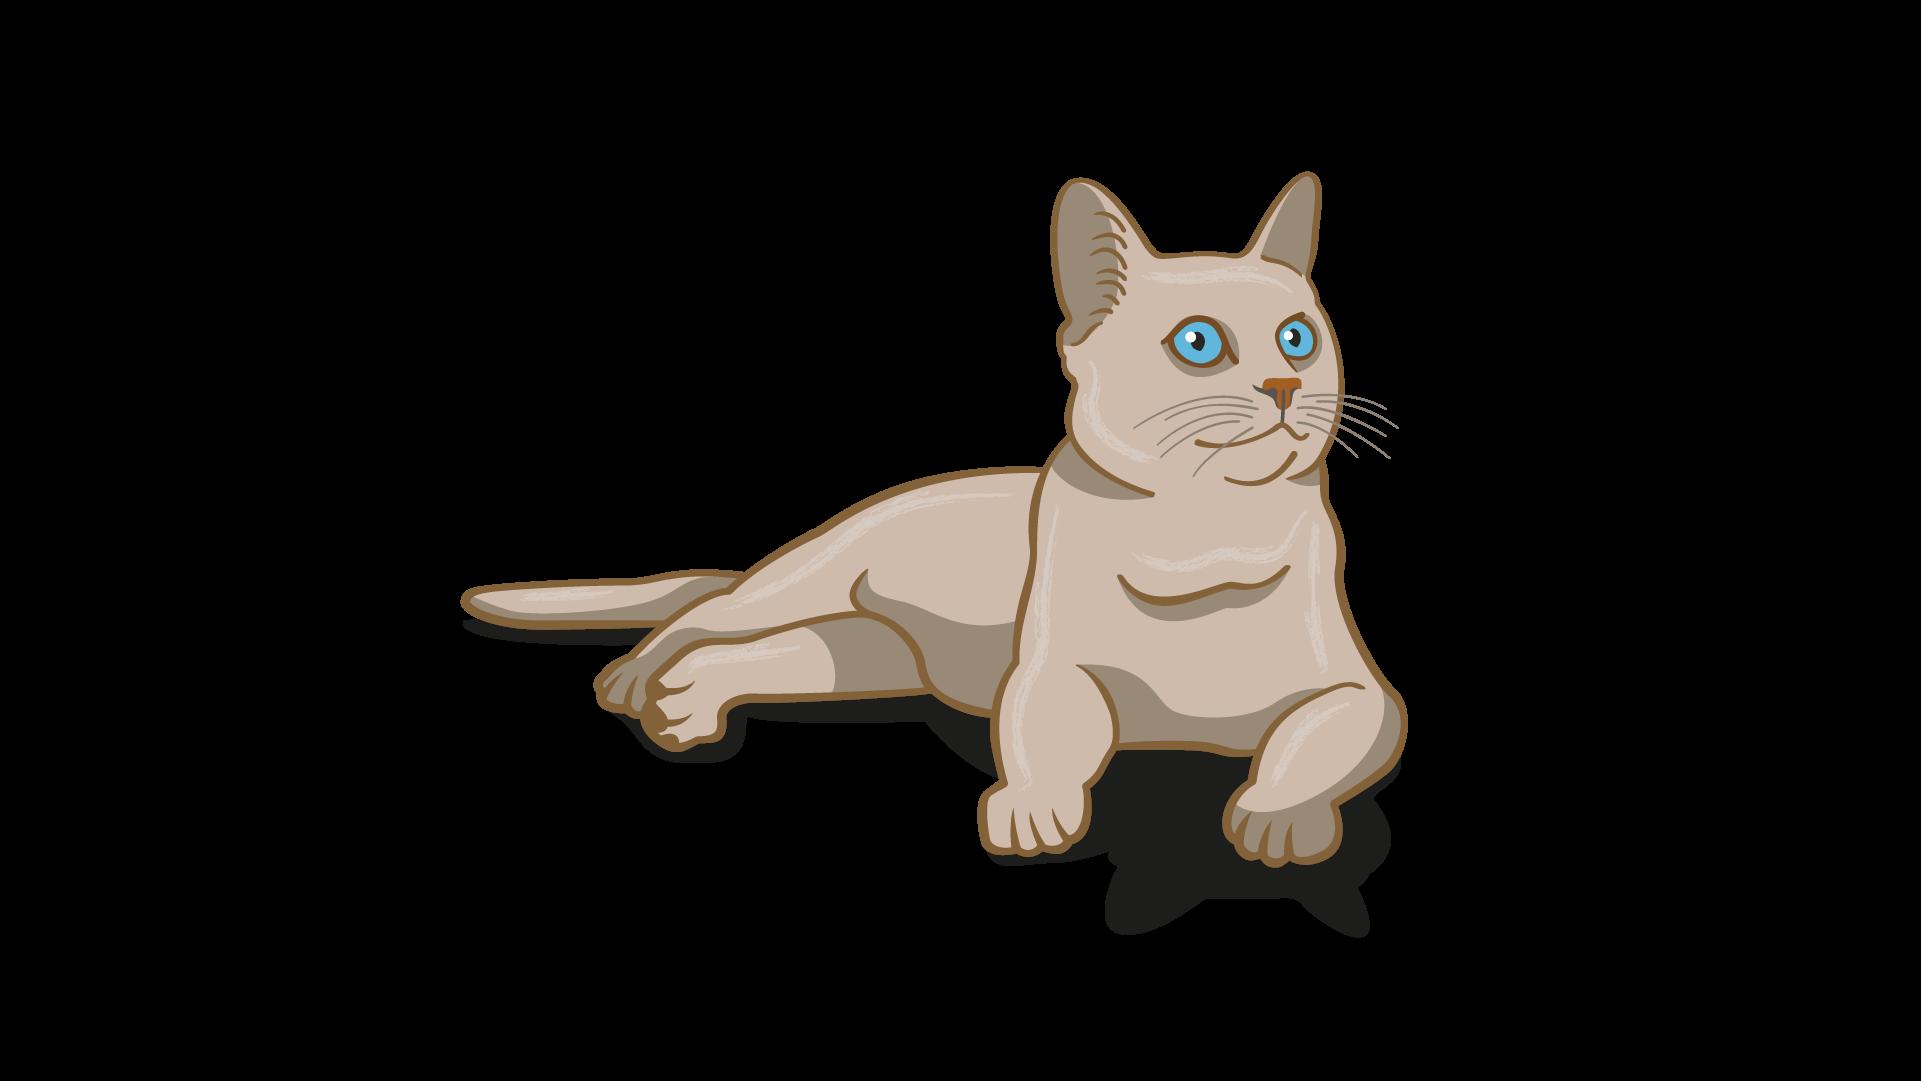 lenguaje corporal relajado del gato